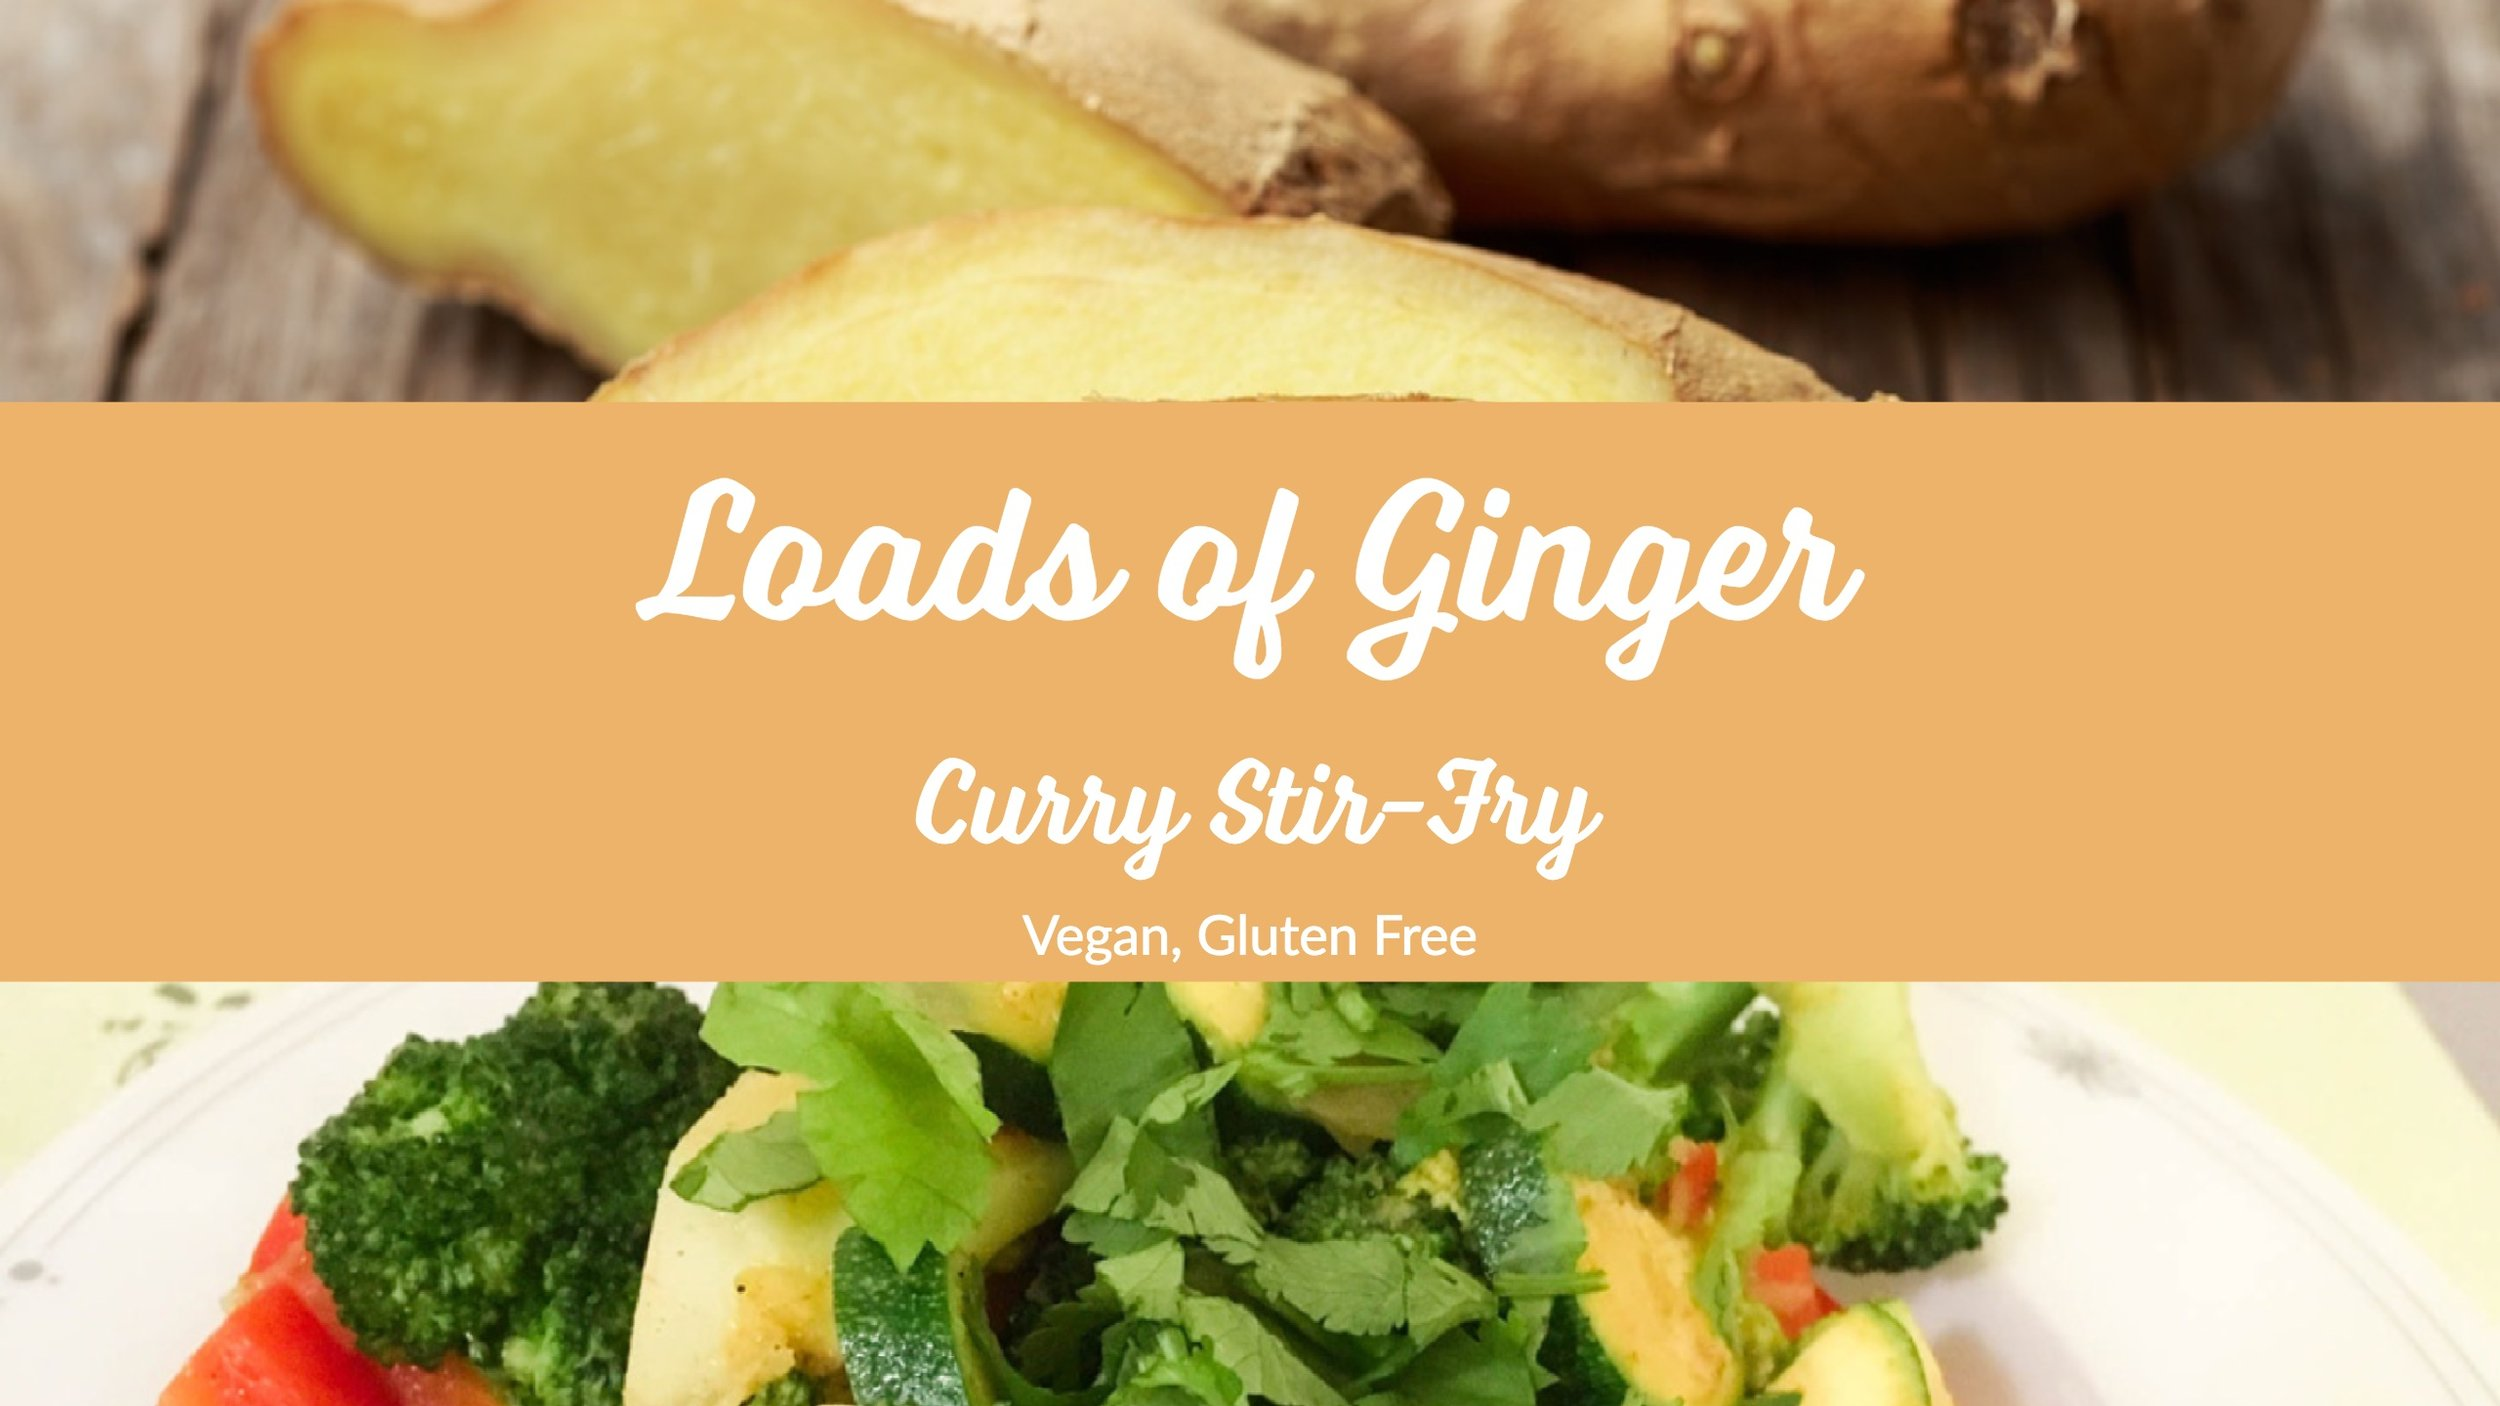 Loads of Ginger Curry Stir-Fry - Vegan, Gluten Free